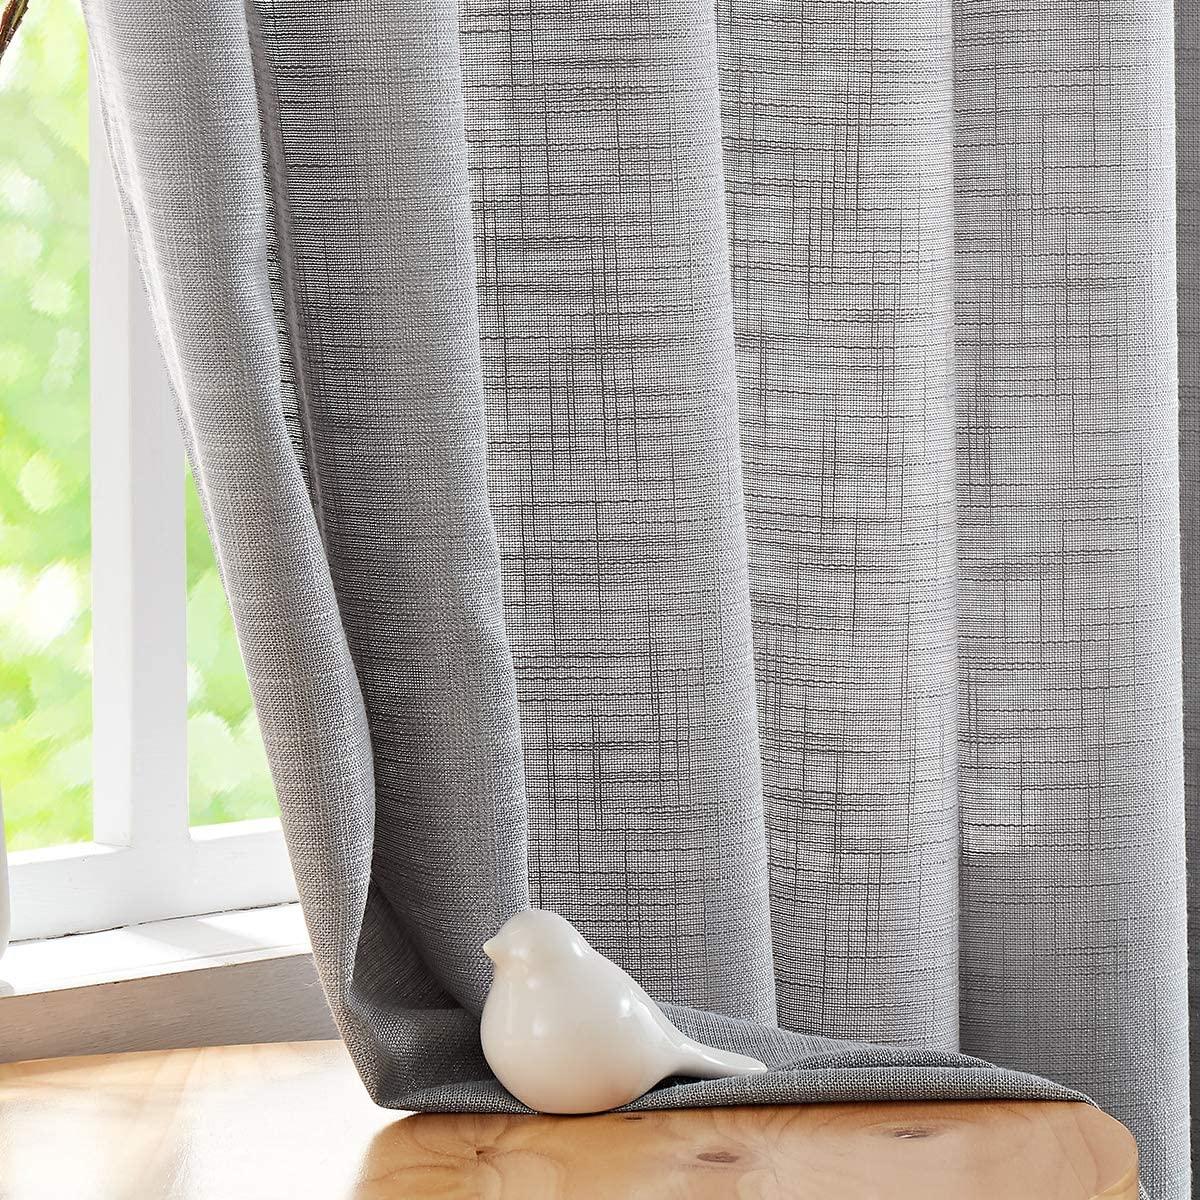 "Fmfunctex Grey Sheer Curtains for Living Room Bedroom Linen Textured Semi-Sheer Window Curtain Drapes 84-inch Length 52""w 2 Panels Grommet Top"